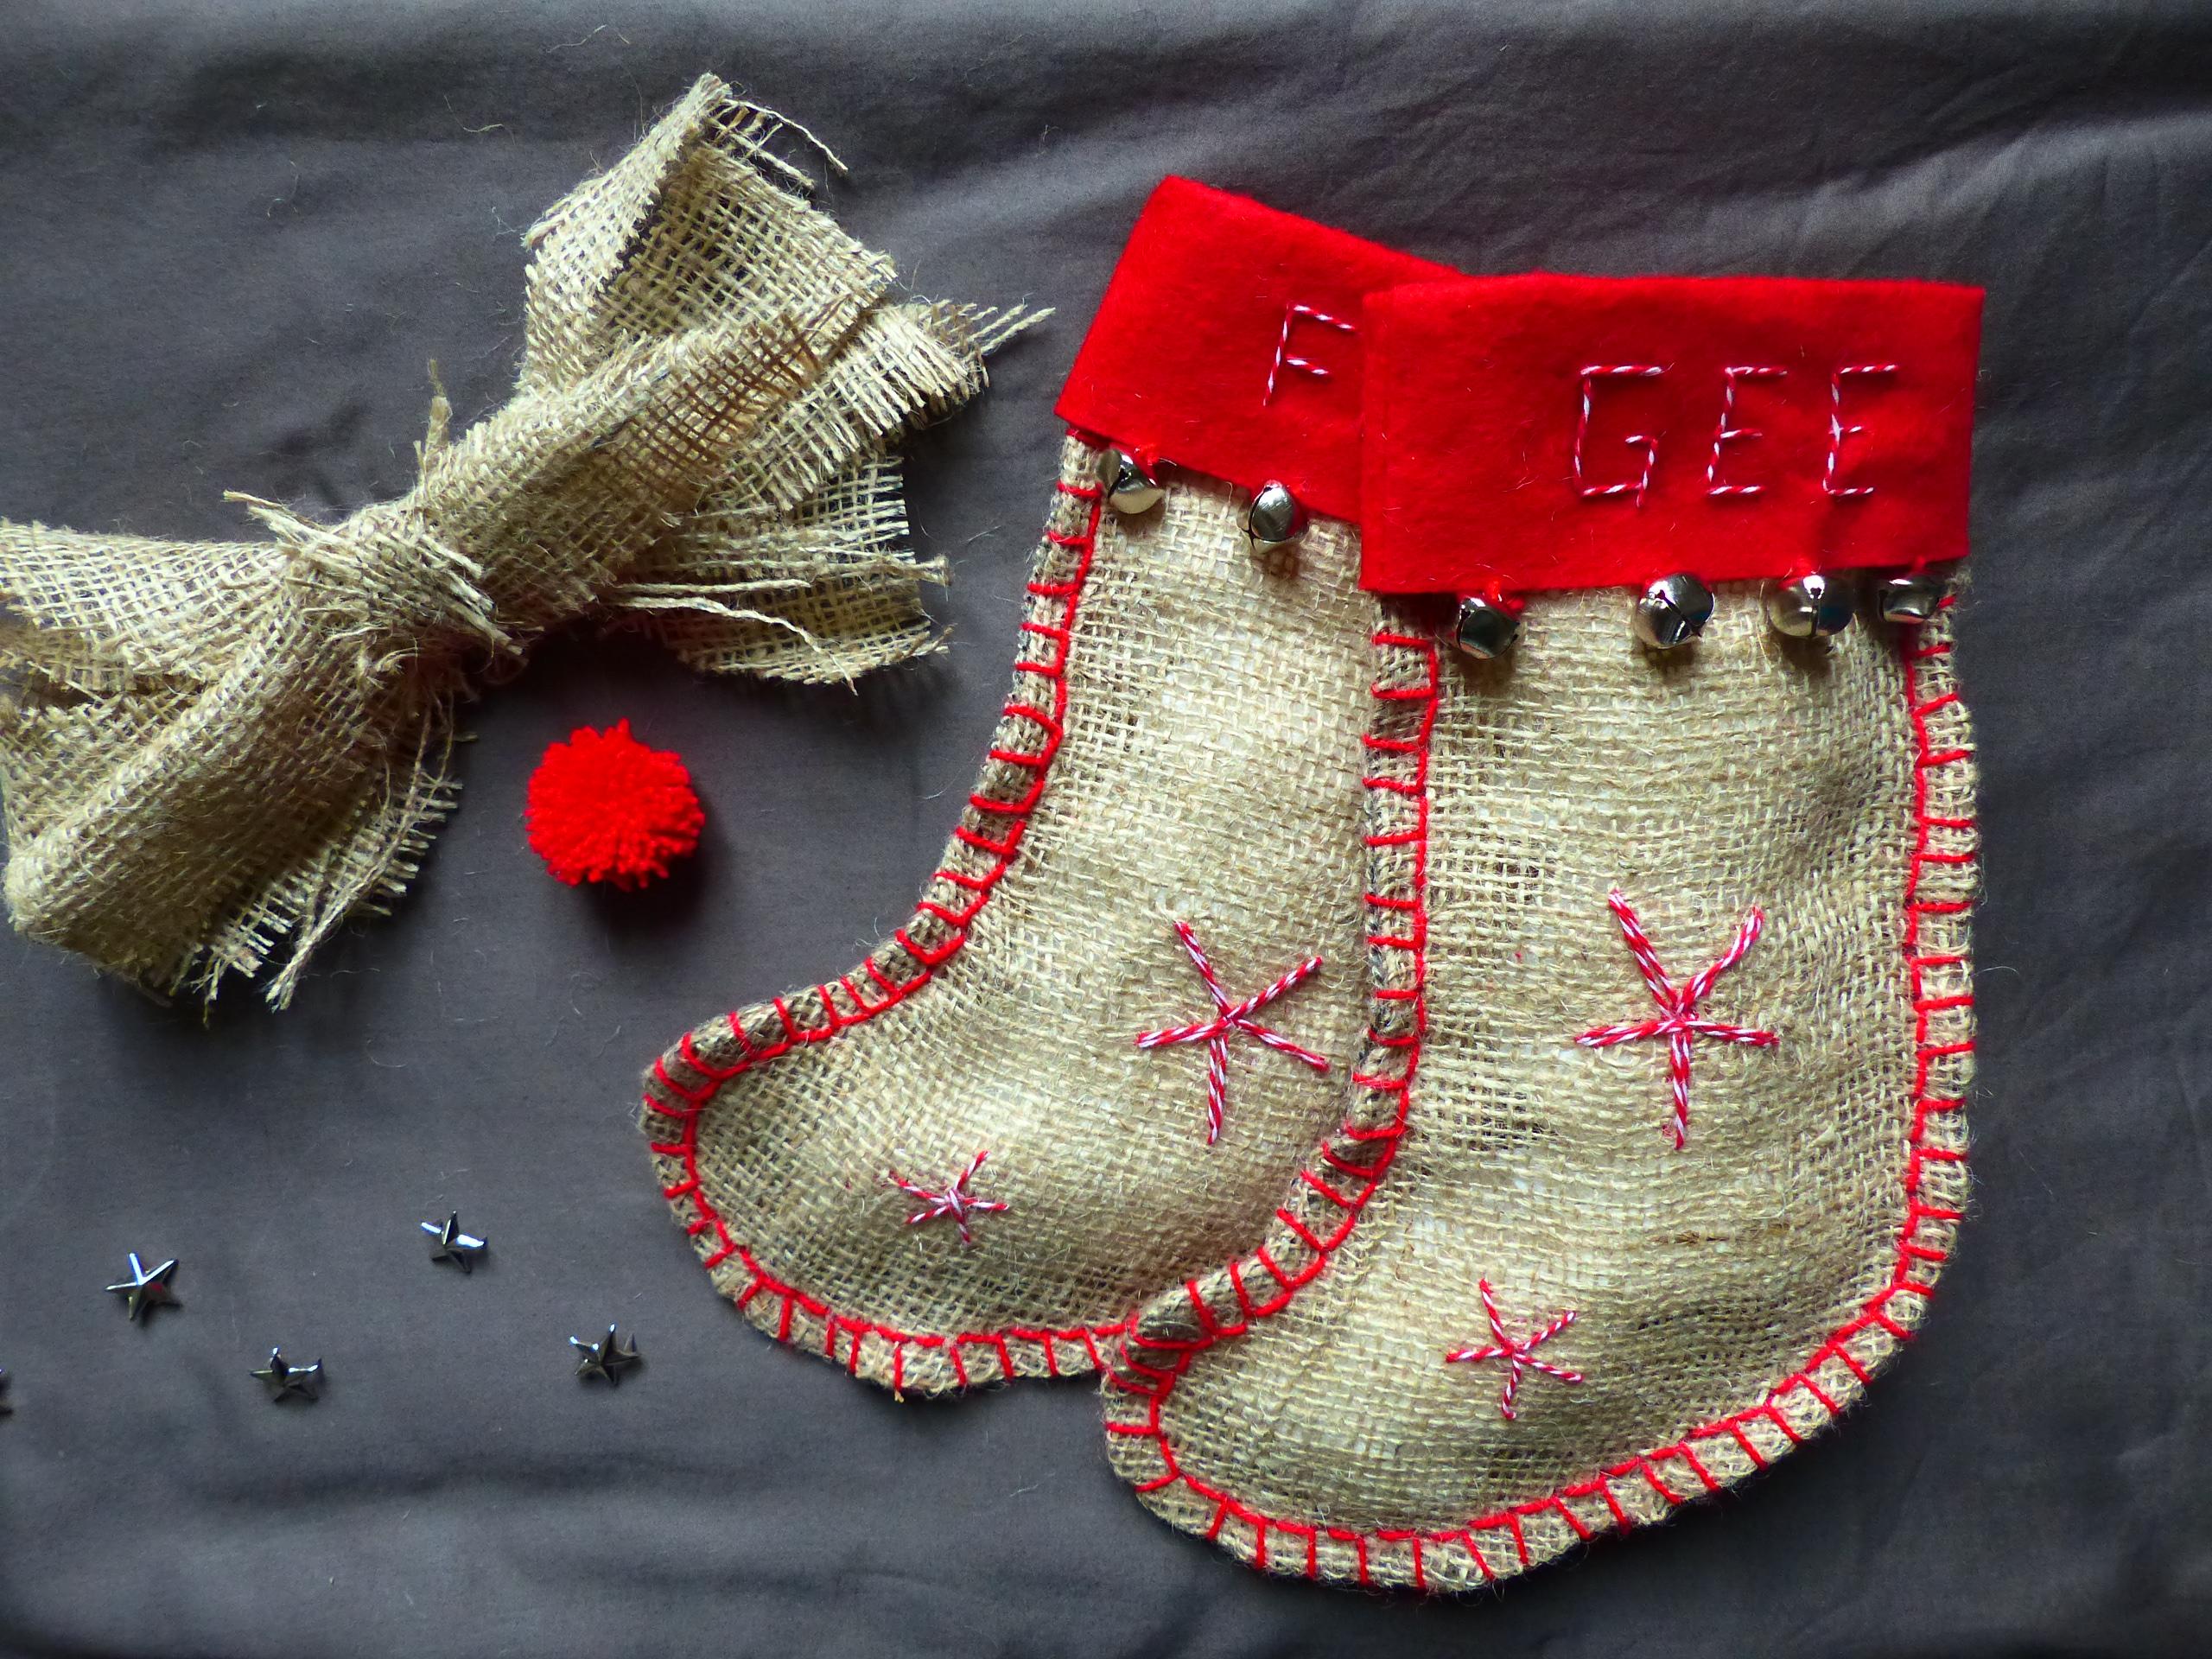 Chaussette de Noel